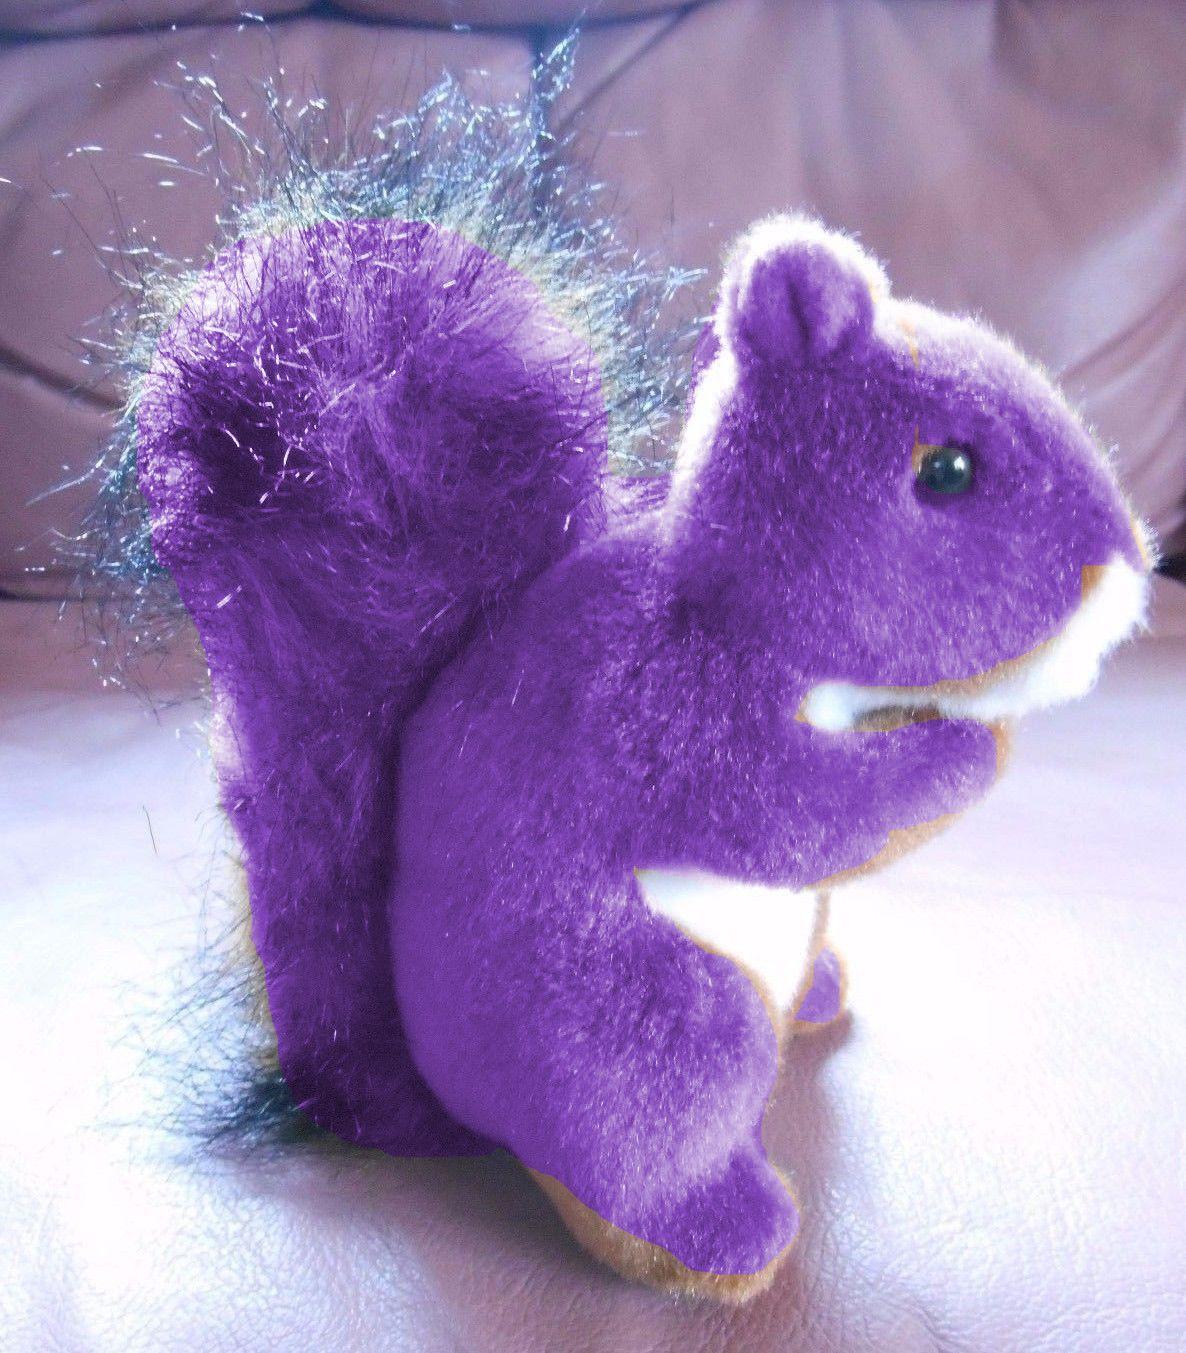 Purple Squirrel Plush Purple Squirrel Squirrel Purple Design [ 1353 x 1186 Pixel ]